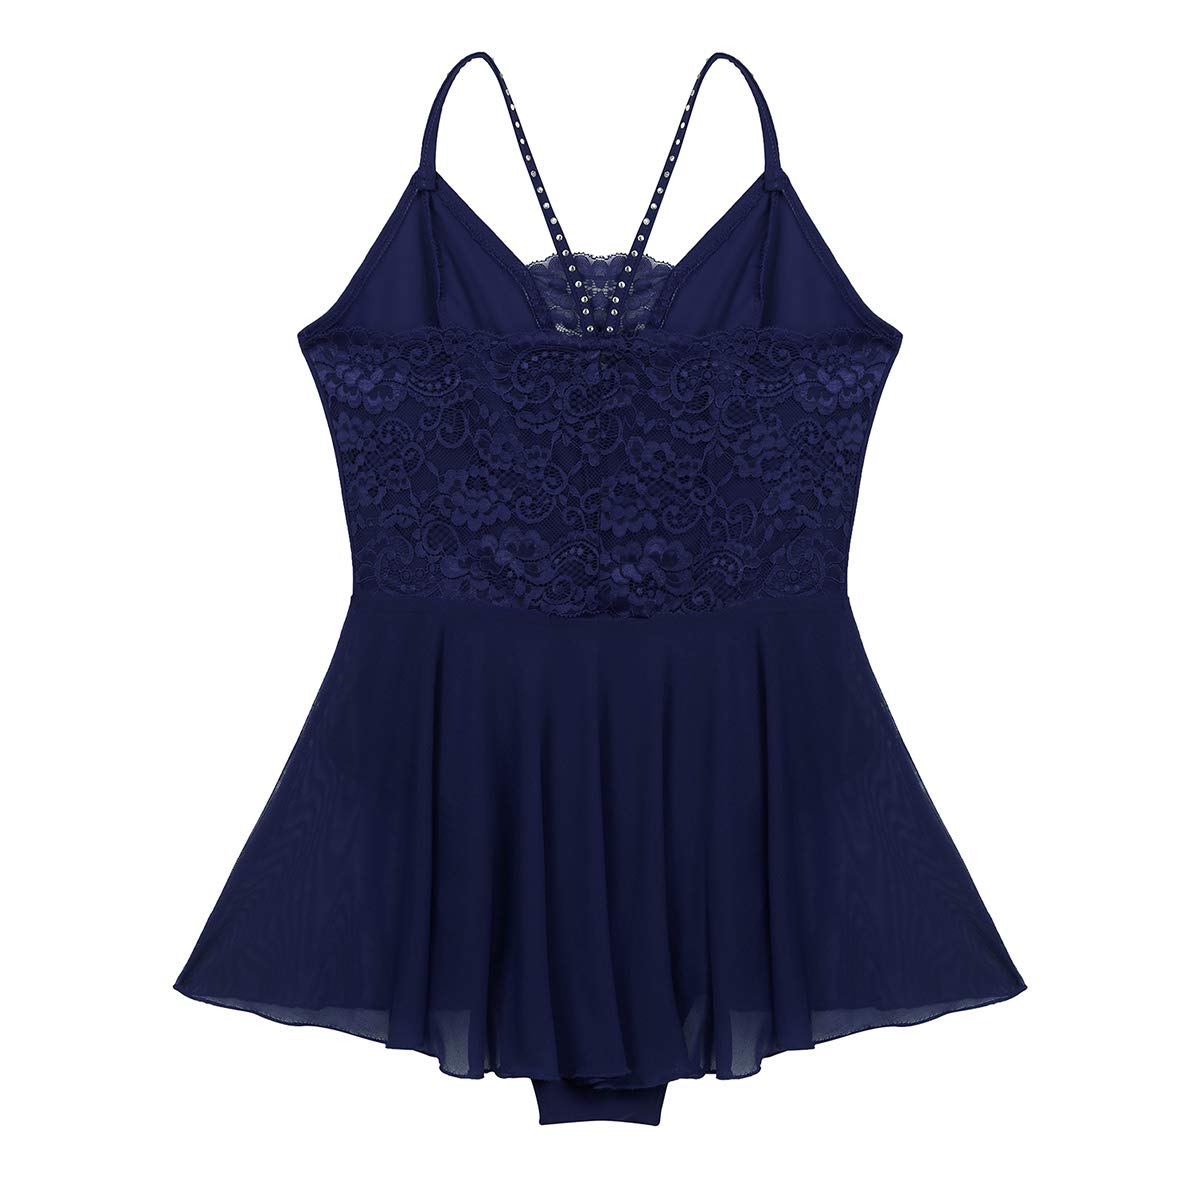 TiaoBug Women Ballet Dress Adult Gymnastics Dance Shiny Rhinestones Lace Back Leotard Costume Dancewear with Skirt